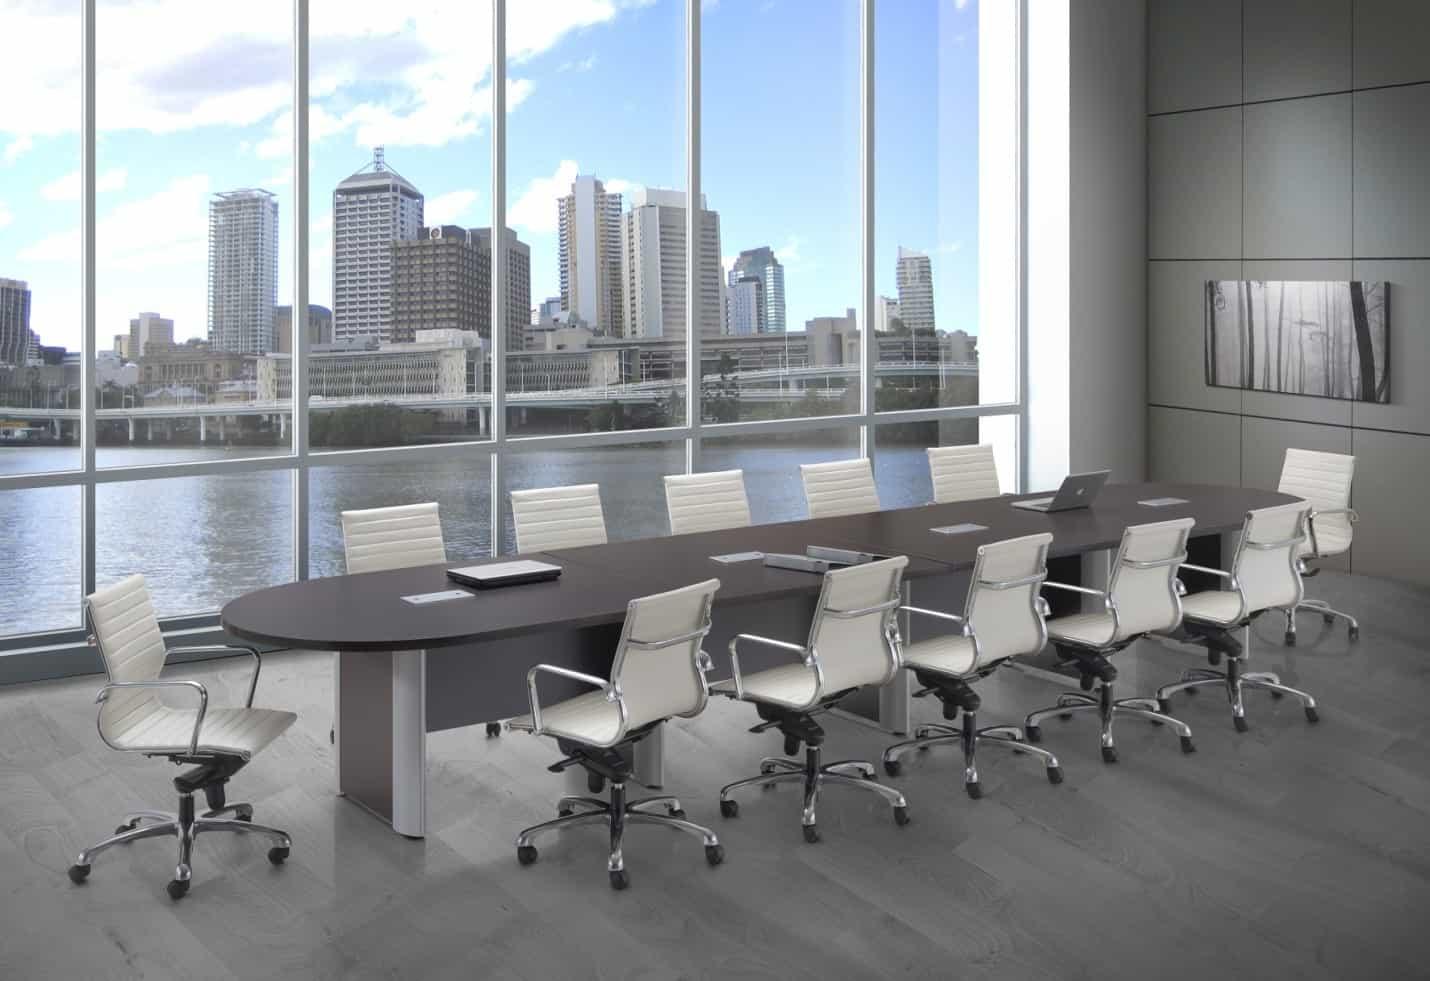 impromptu oval office meeting - HD1430×981